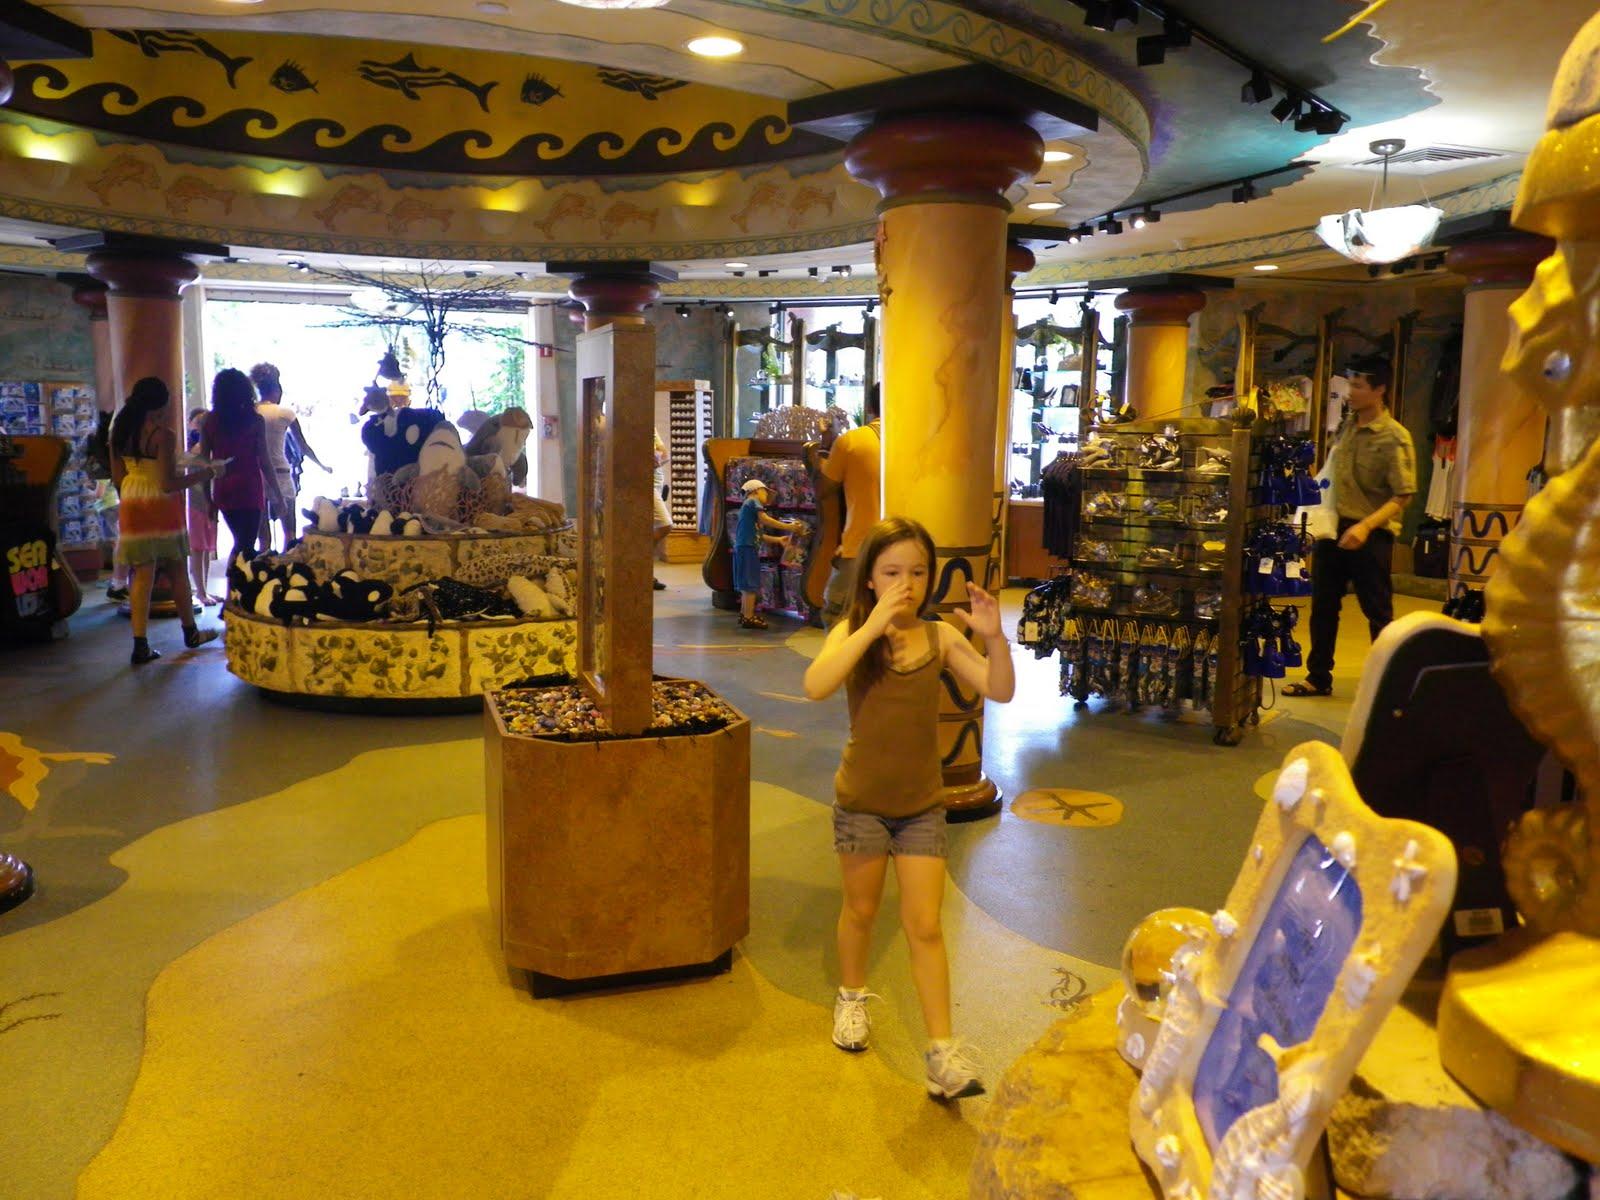 The Blakemore Family: Make A Wish Trip Day 3 - SeaWorld